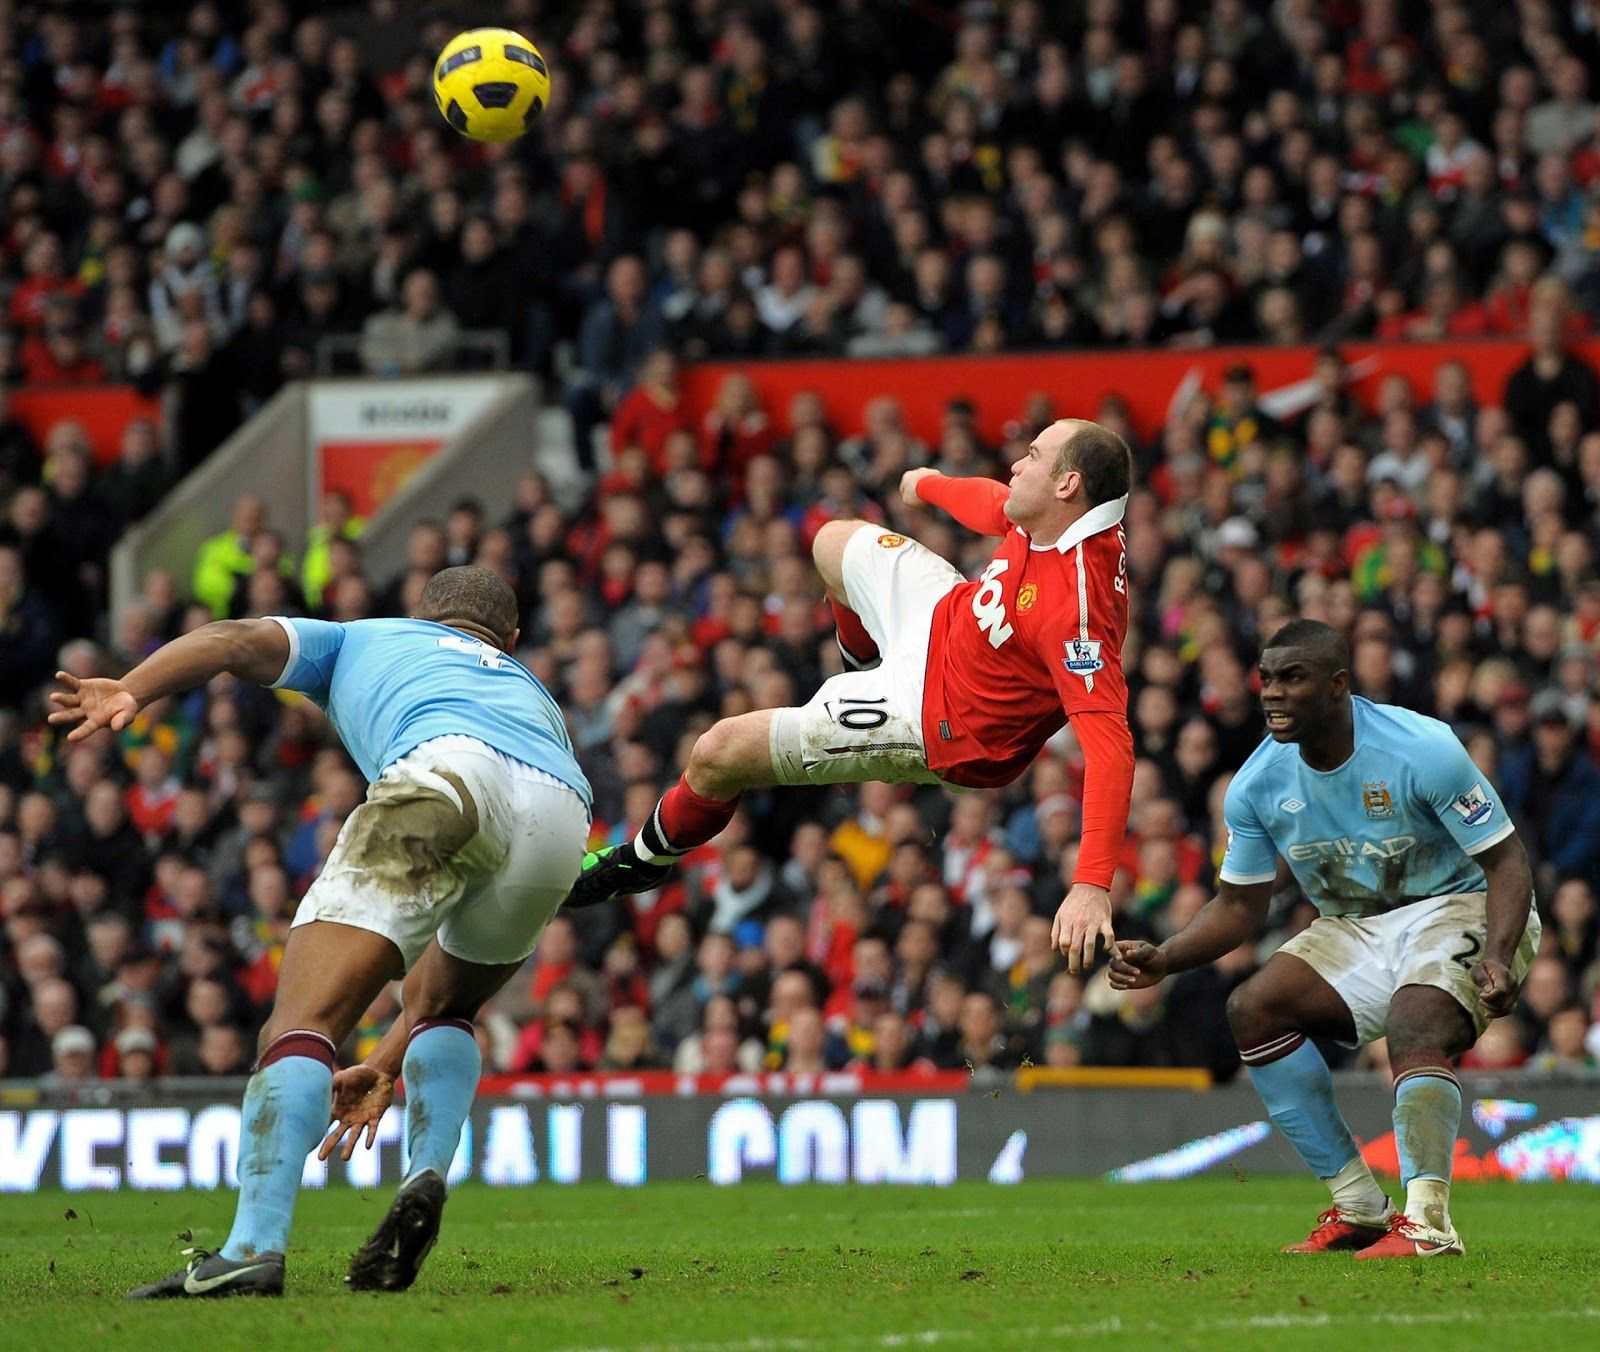 Wayne Rooney Bicycle Kick Bicycle Kick Wayne Rooney Manchester